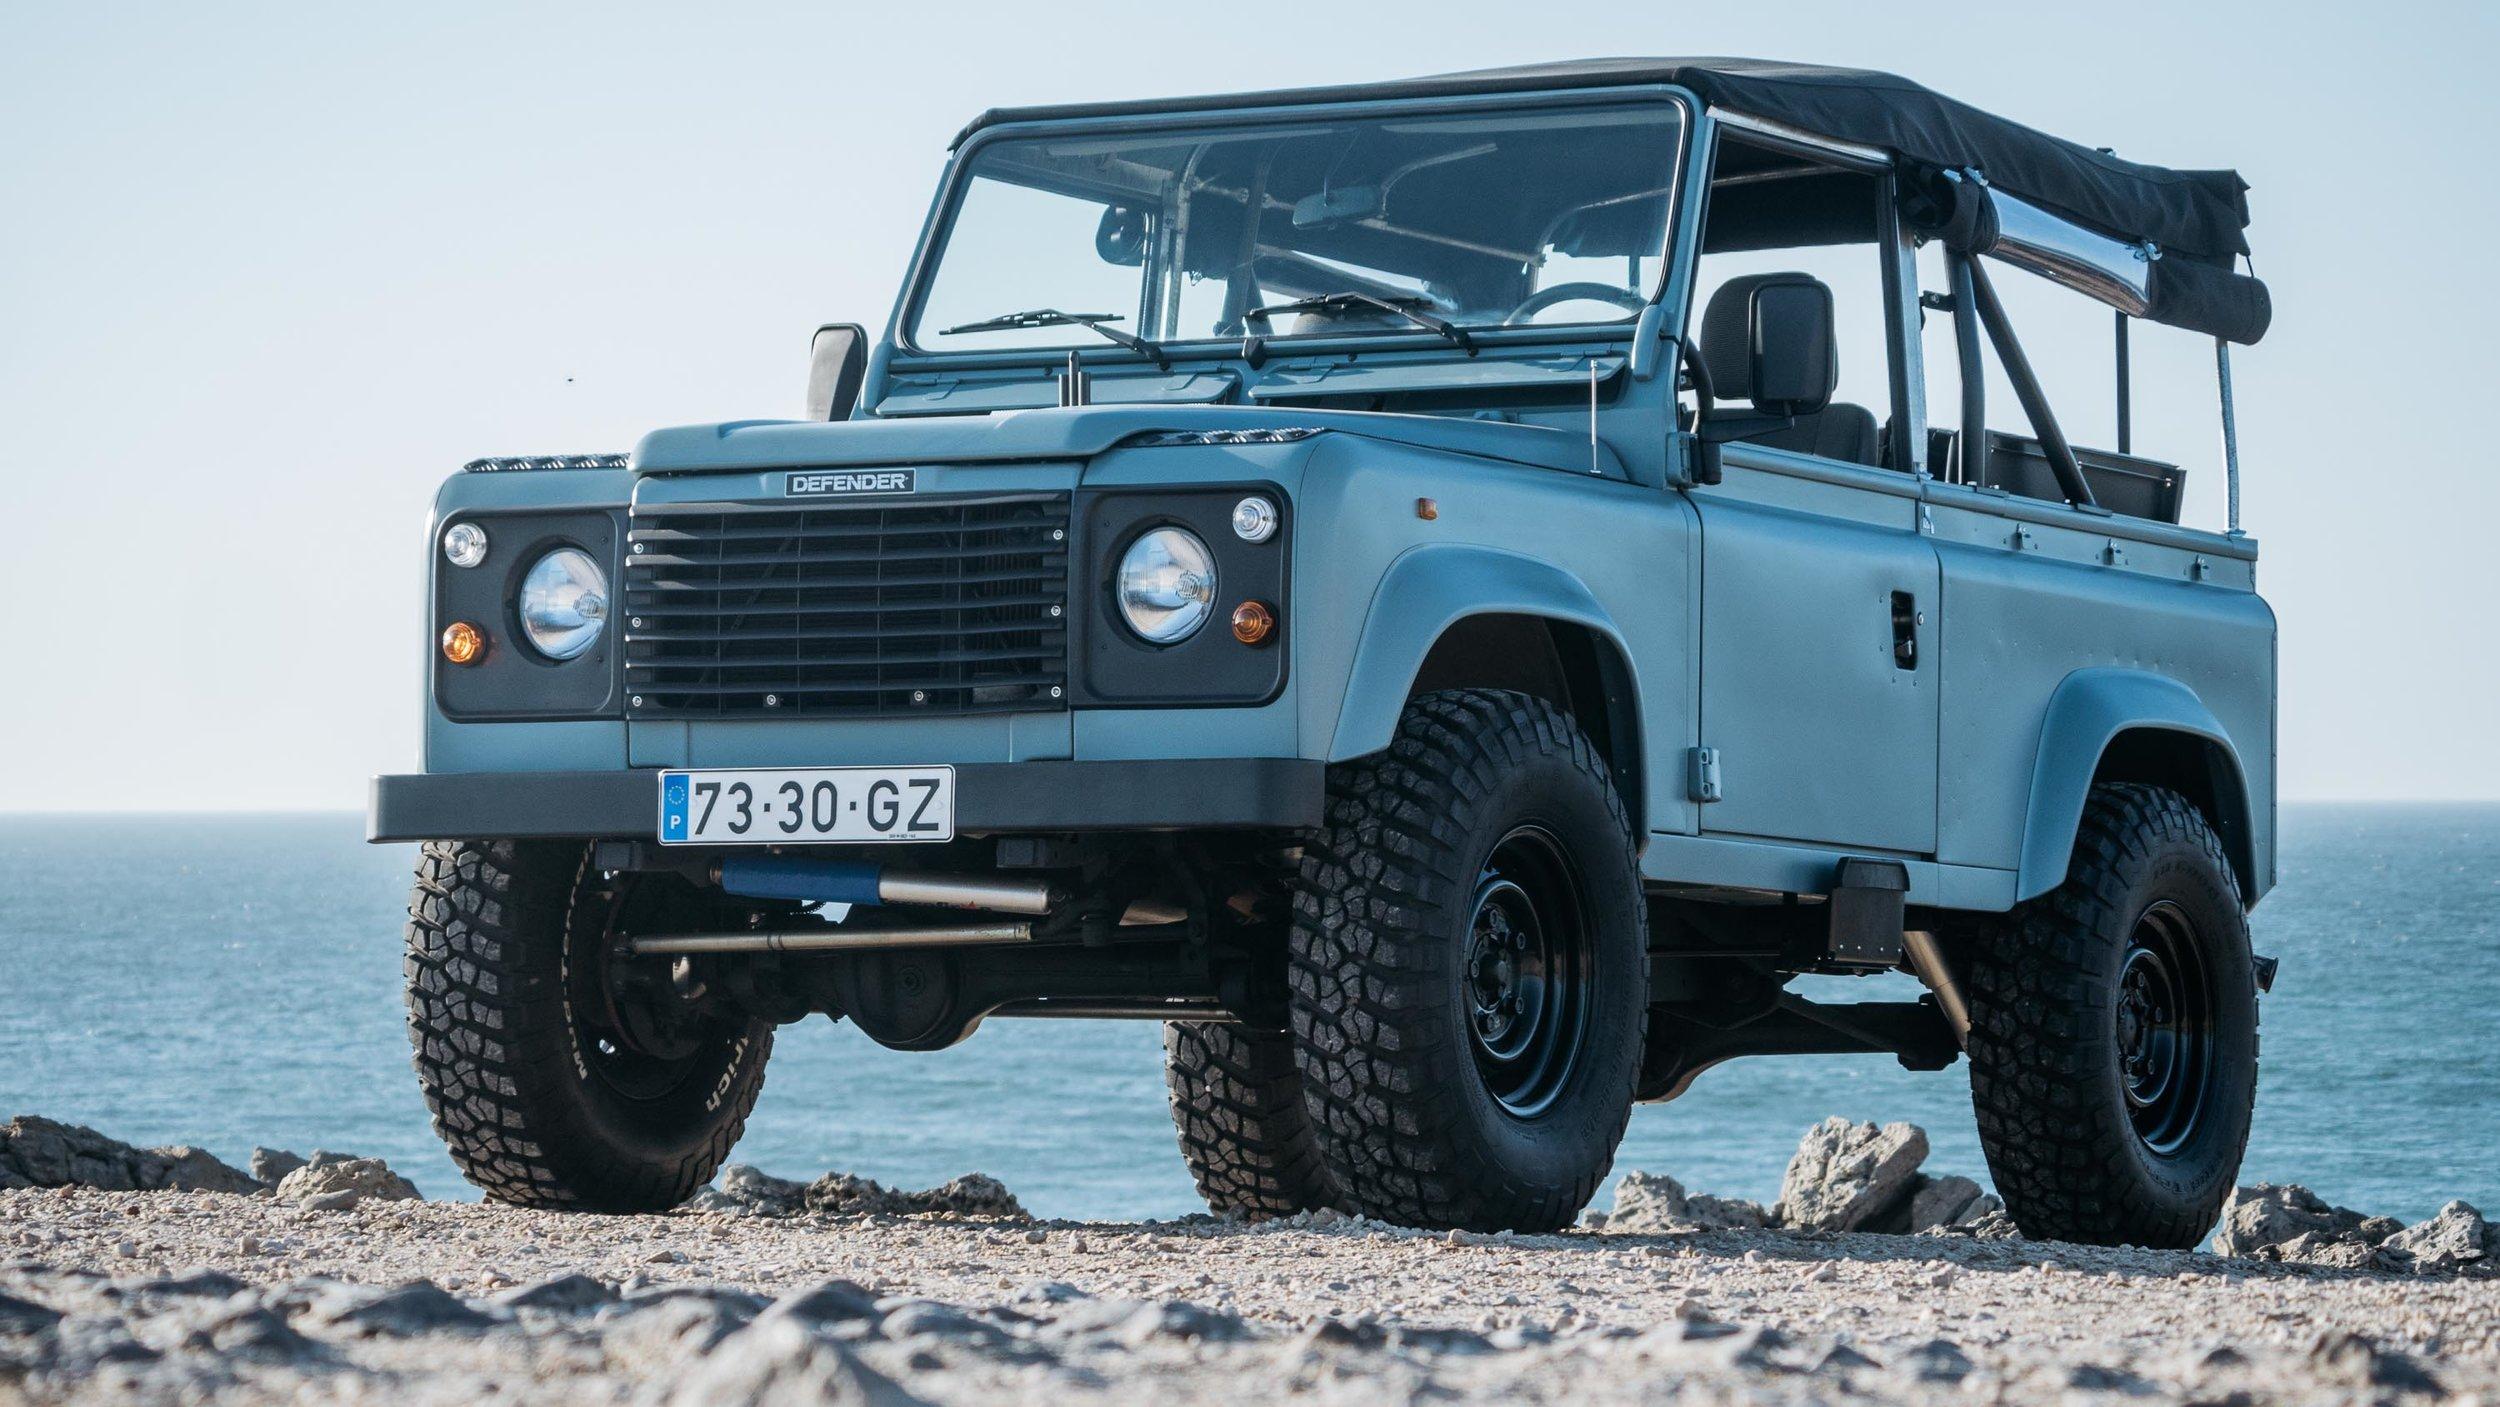 coolnvintage Land Rover Defender (78 of 98).jpg